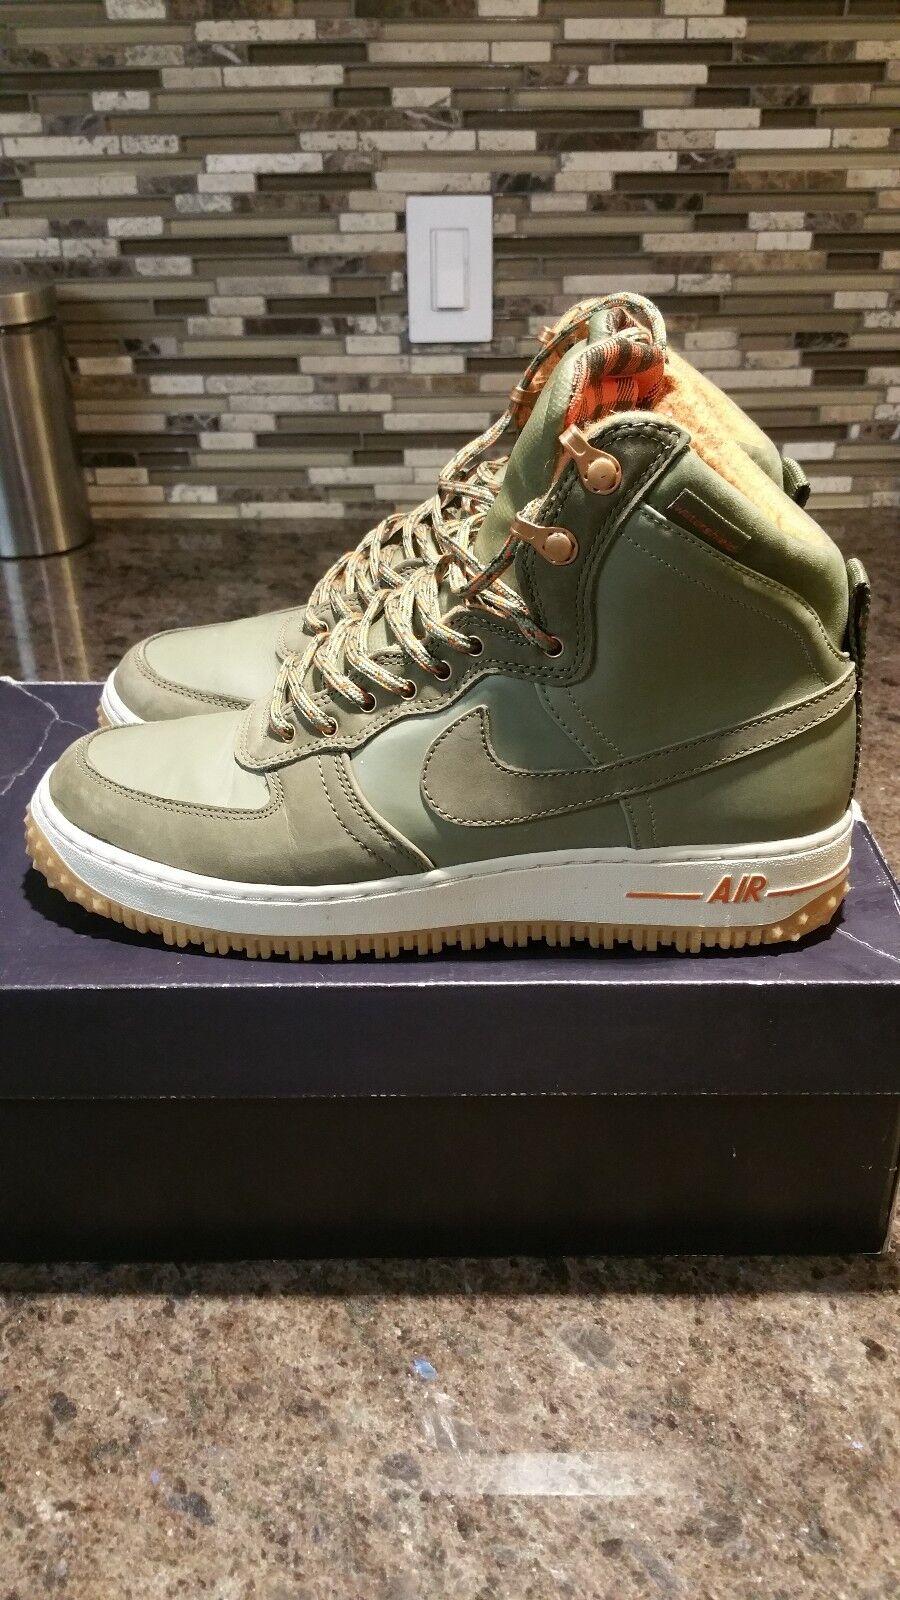 Nike Air Force 1 HI DCNS MTRY BT ST sz 9